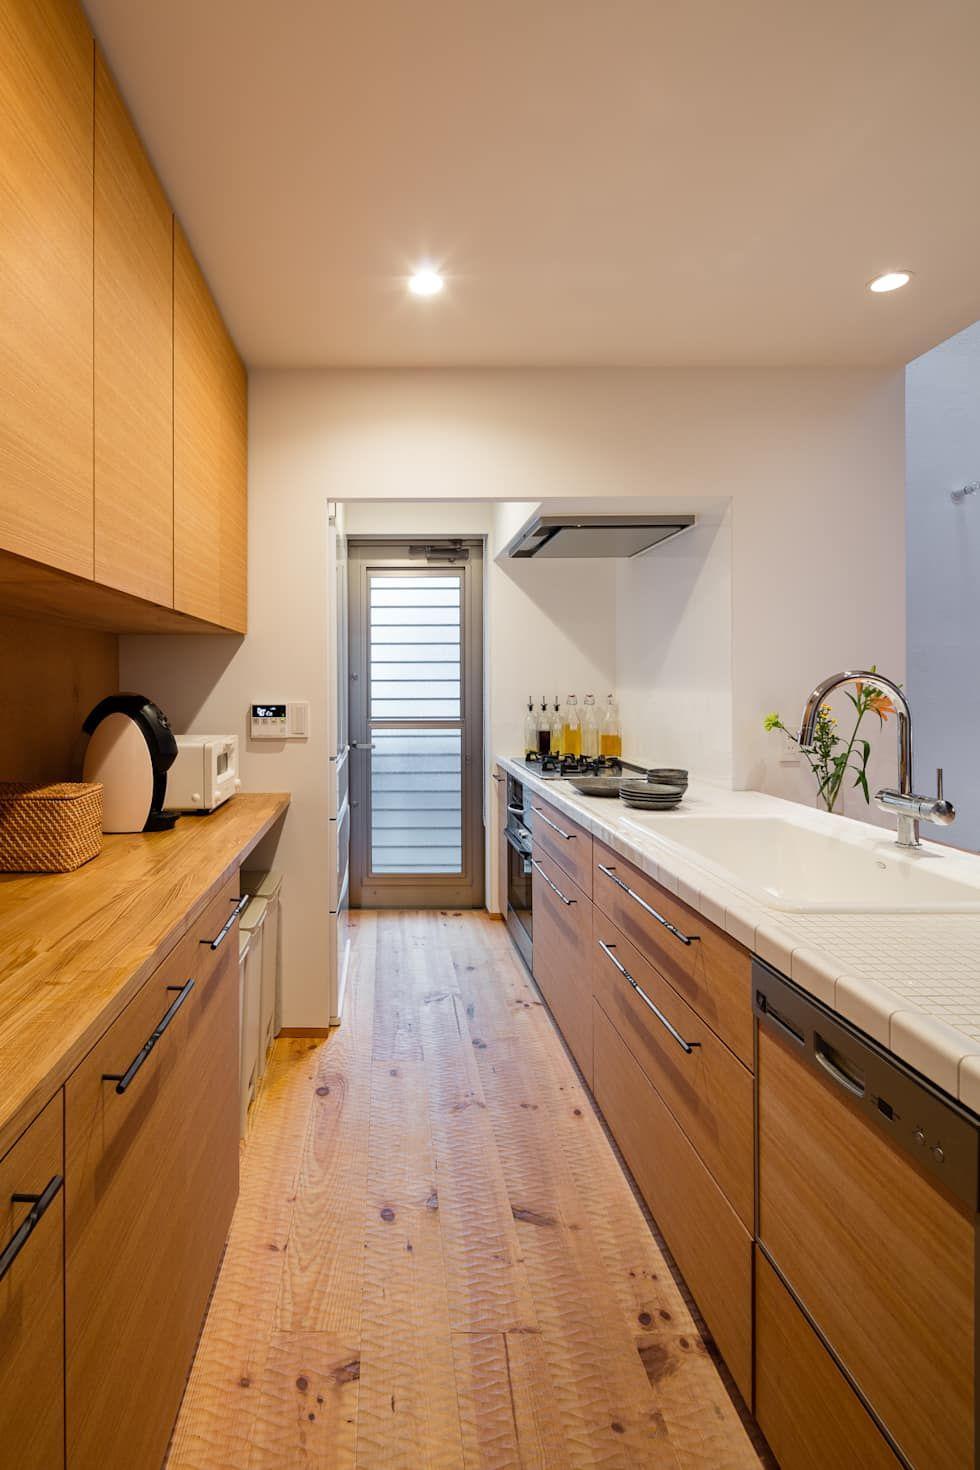 1f Ldk 和風の キッチン の 内海聡建築設計事務所 和風 キッチンの